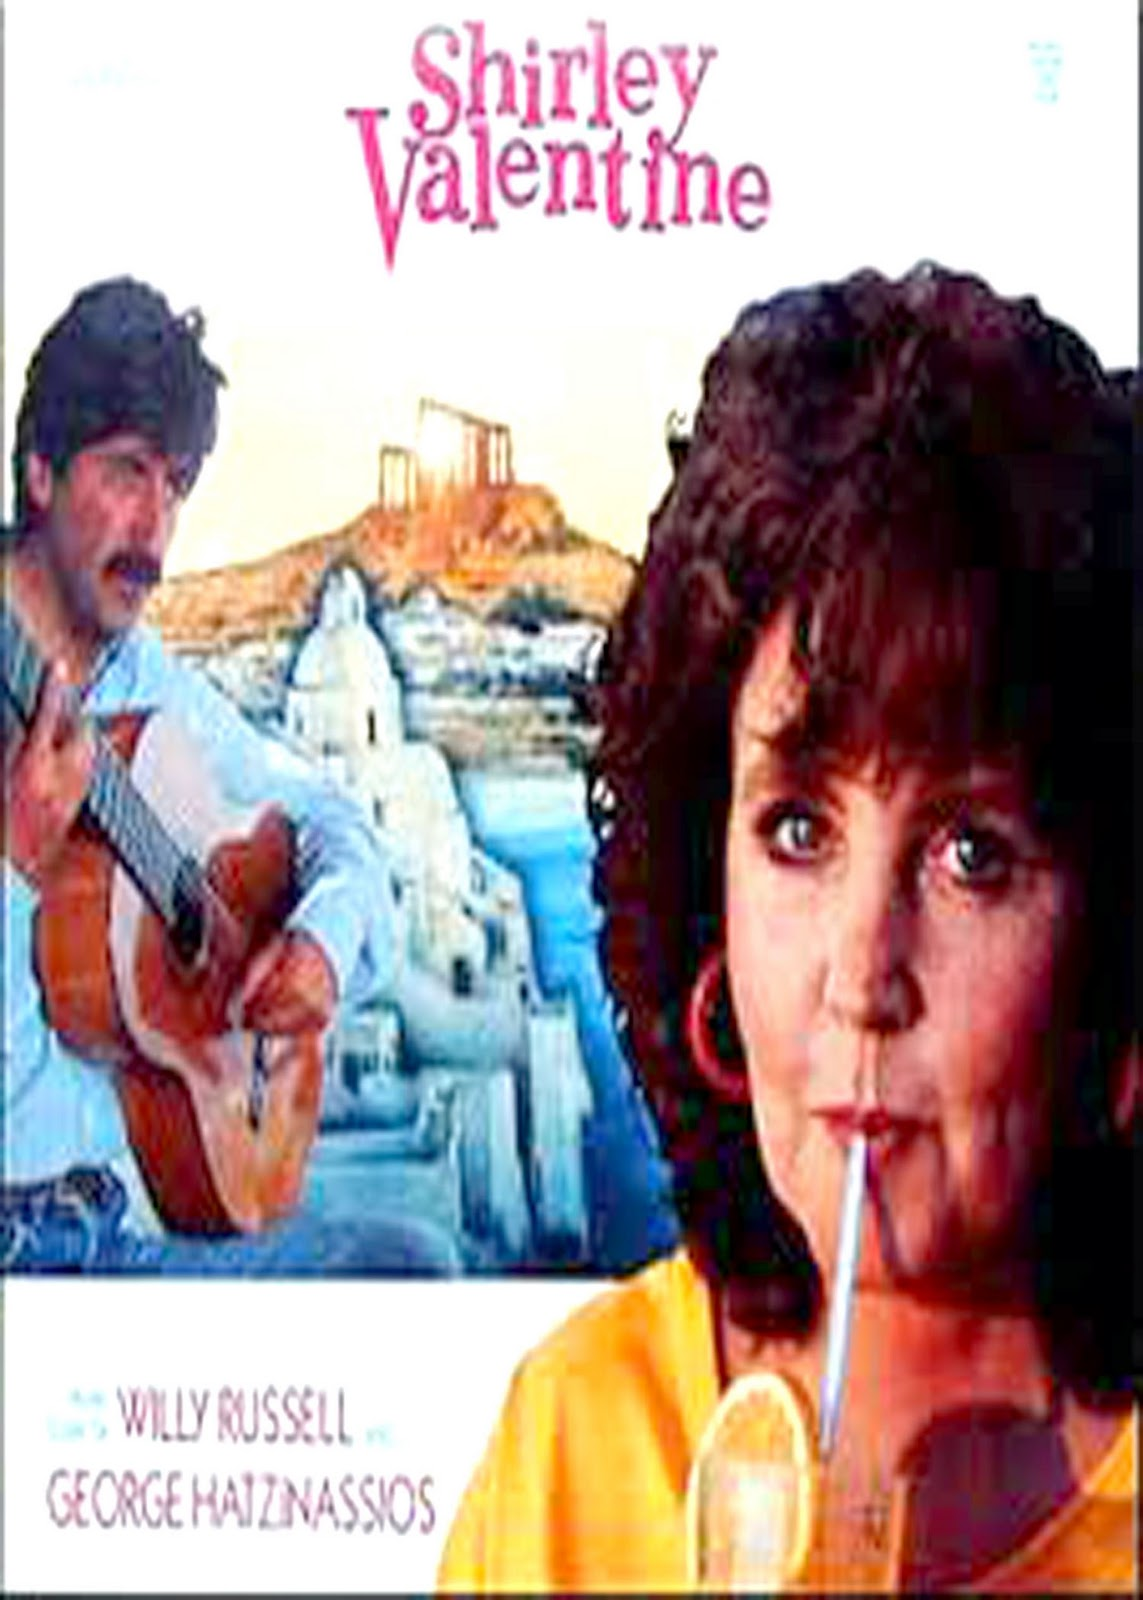 download movie shirley valentine 1989 internetbing